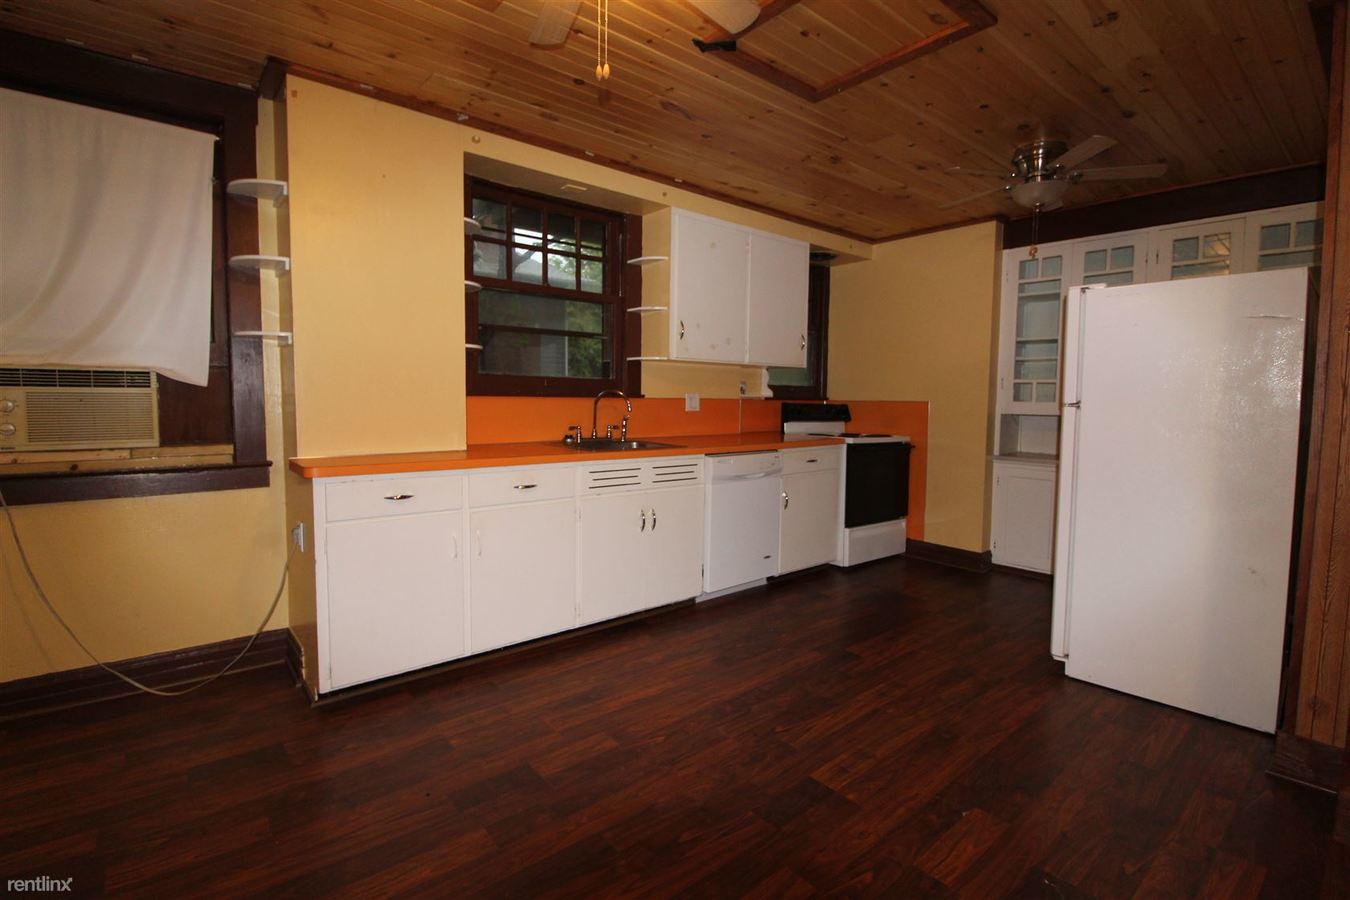 1 Bedroom 1 Bathroom Apartment for rent at 1052 Baldwin Ave in Ann Arbor, MI